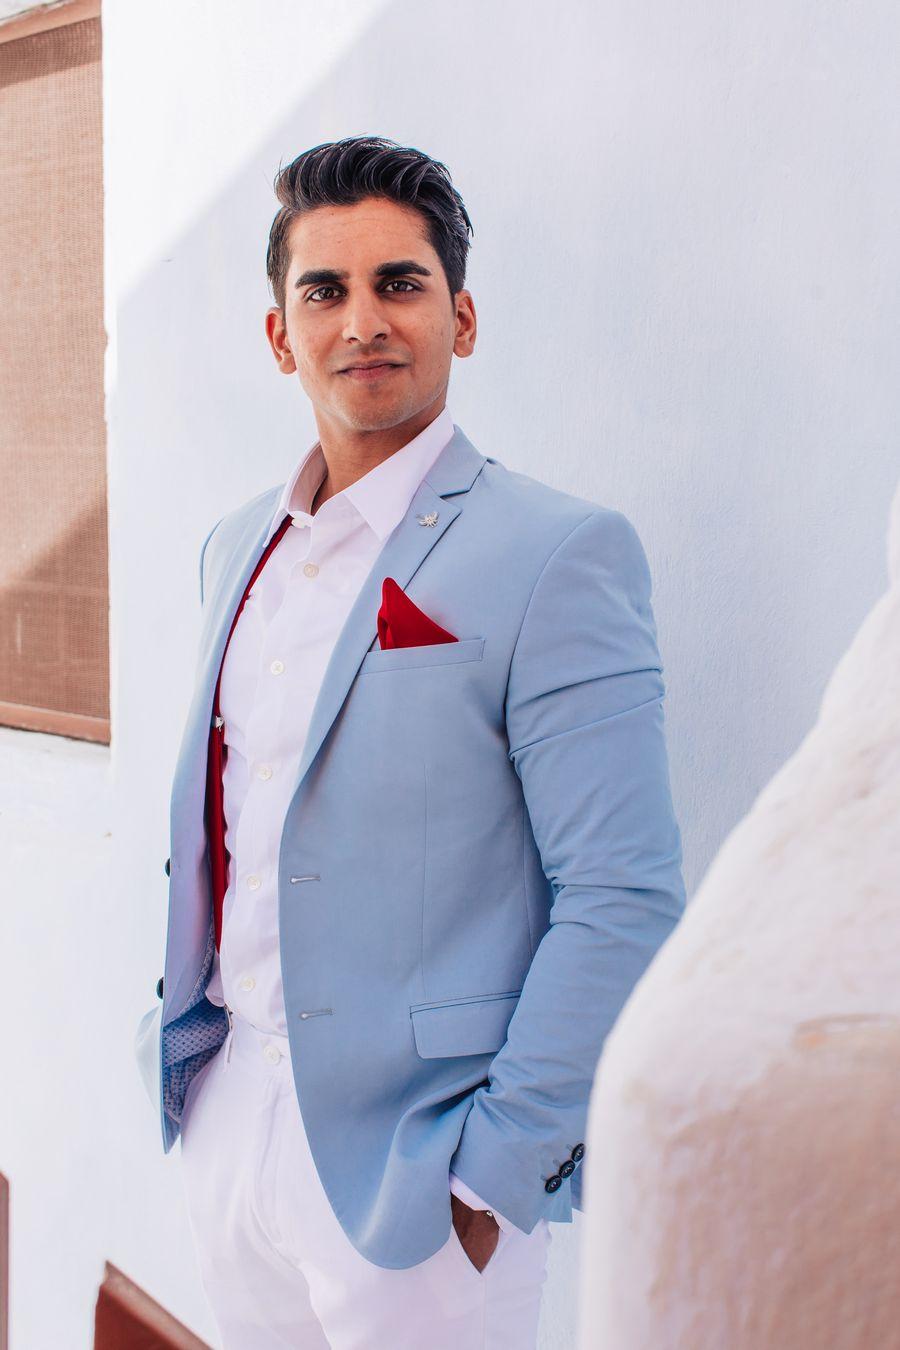 Unique Off White Suit For Wedding Gift - Wedding Dress Ideas ...